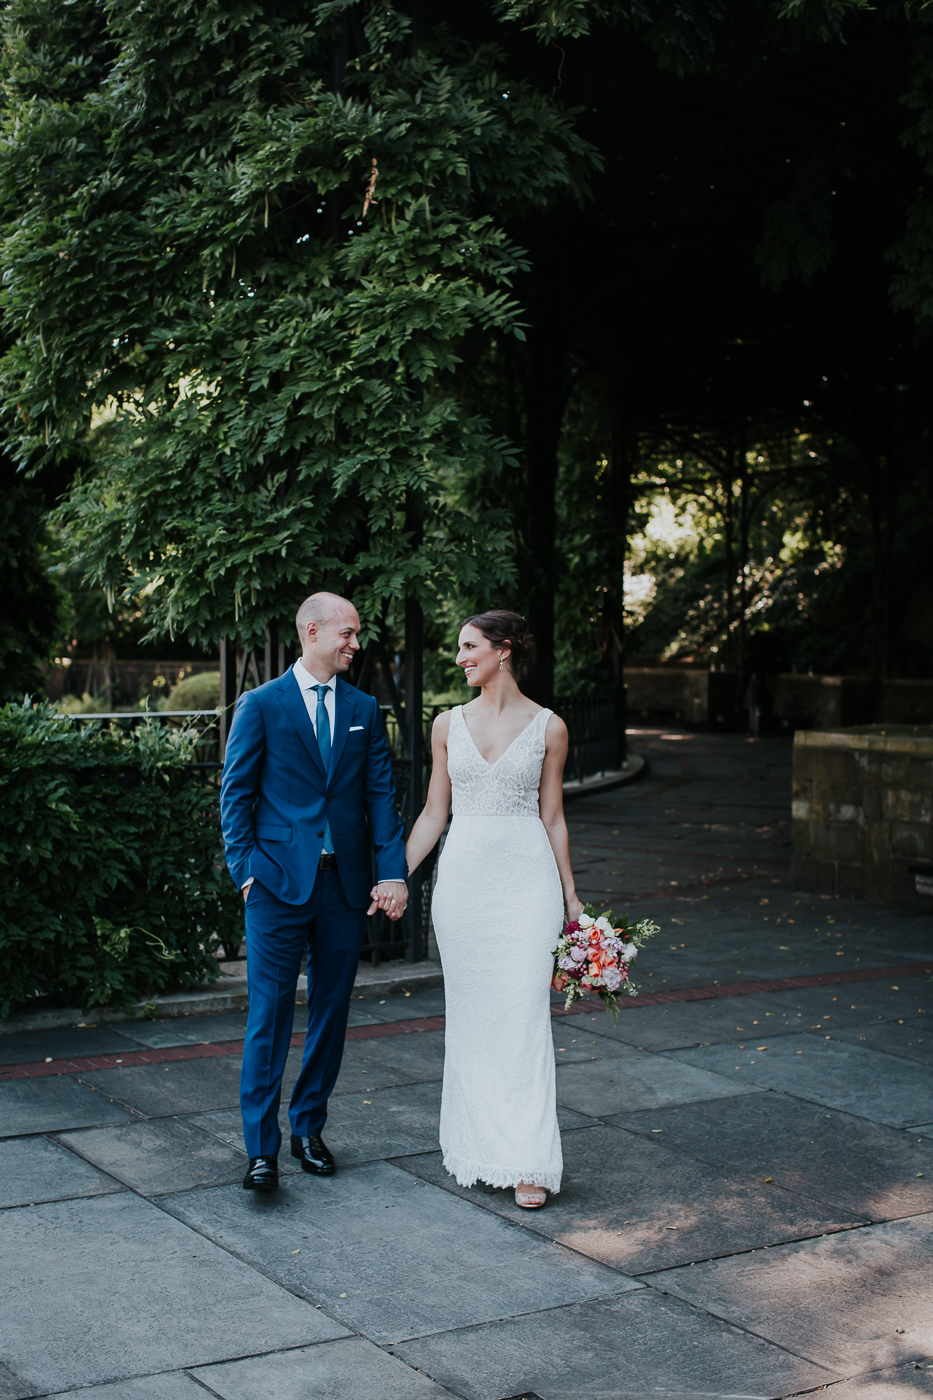 NYC-Central-Park-Conservatory-Garden-Intimate-Elopement-Documentary-Wedding-Photographer-36.jpg